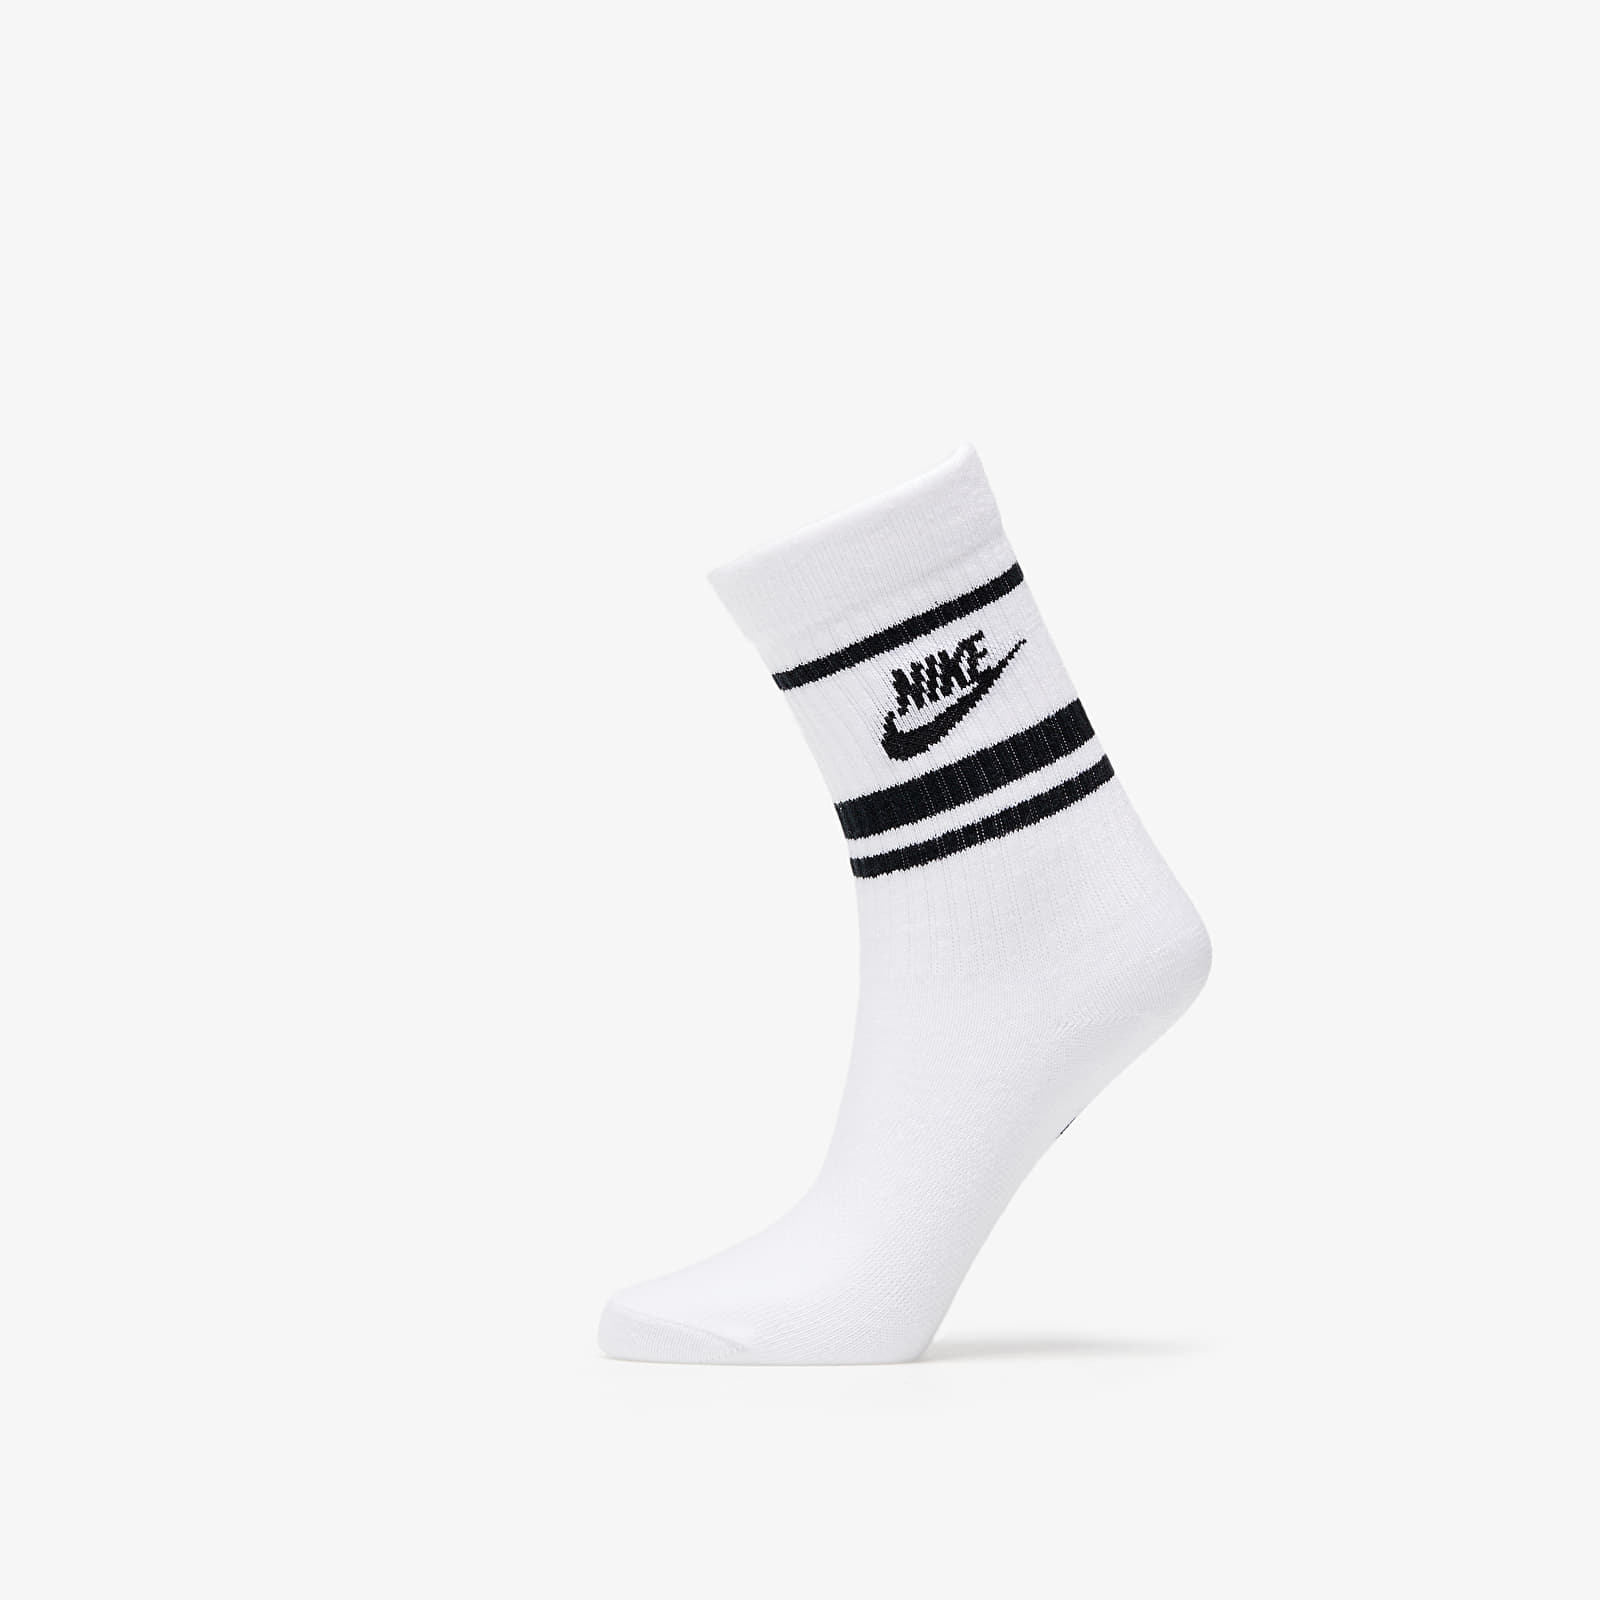 Ponožky Nike Sportswear Essential Crew Socks (3 Pairs) White/ Black/ Black